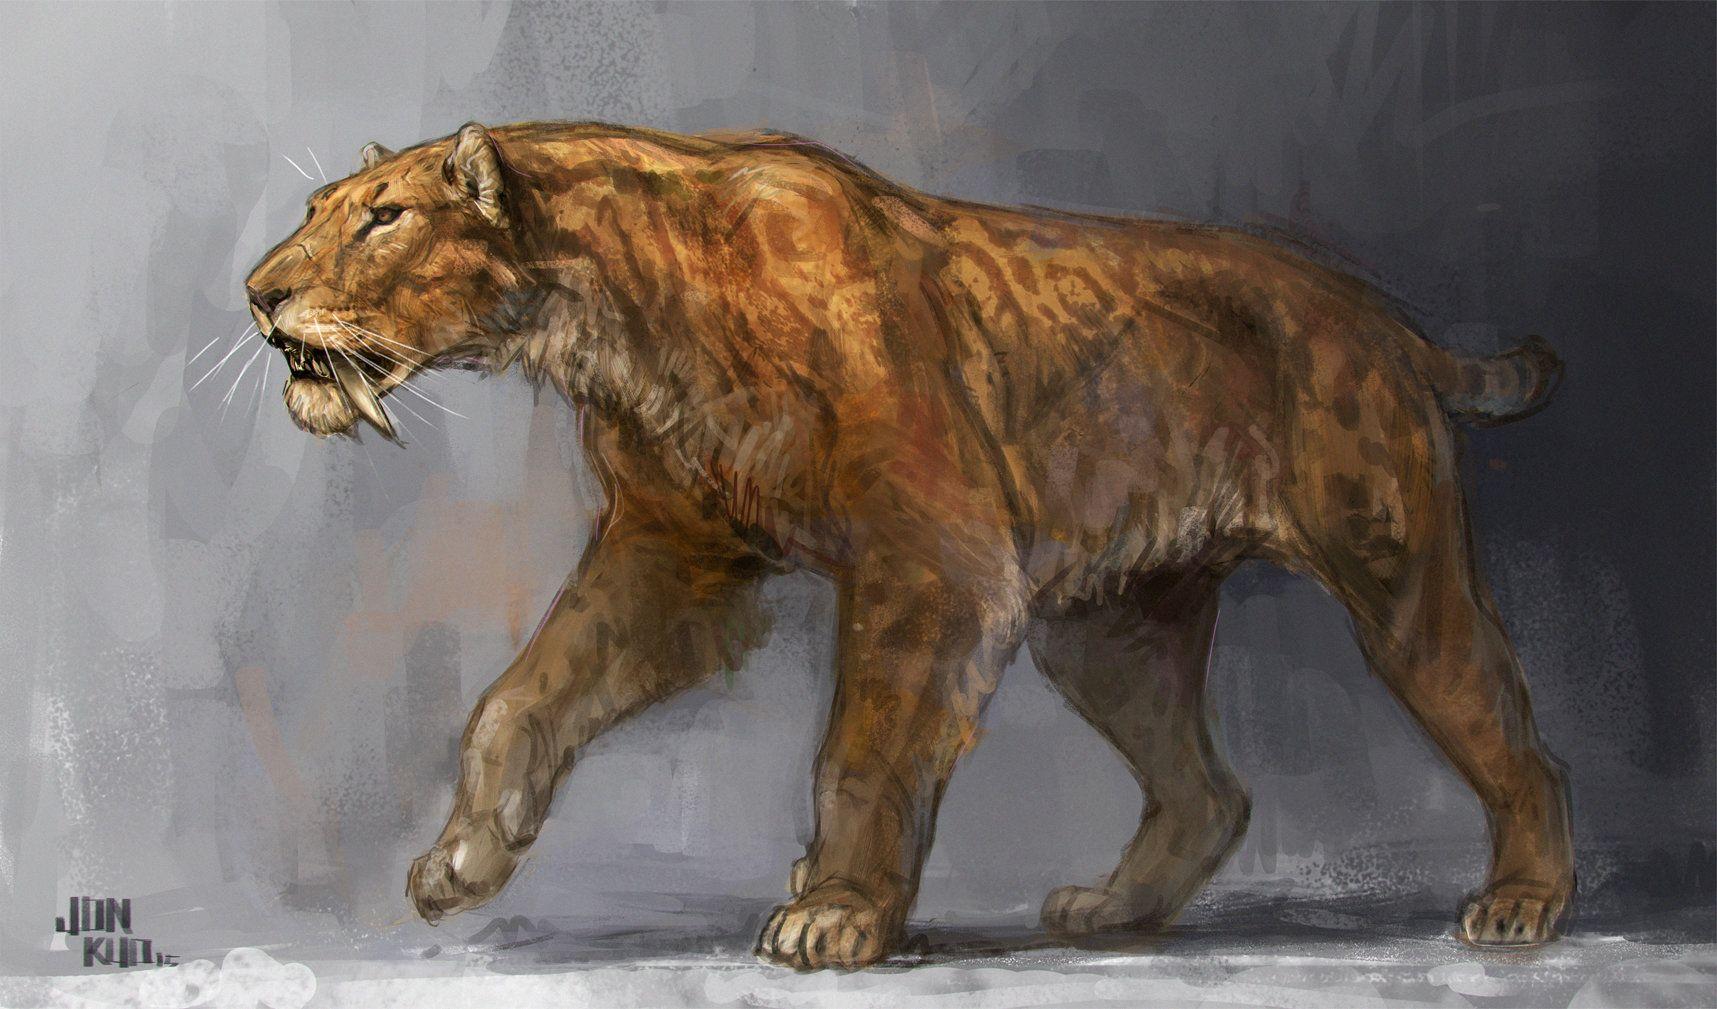 Smilodon Face By Pyroraptor42 On Deviantart: Dinosaurs & Pre Historic Animals !